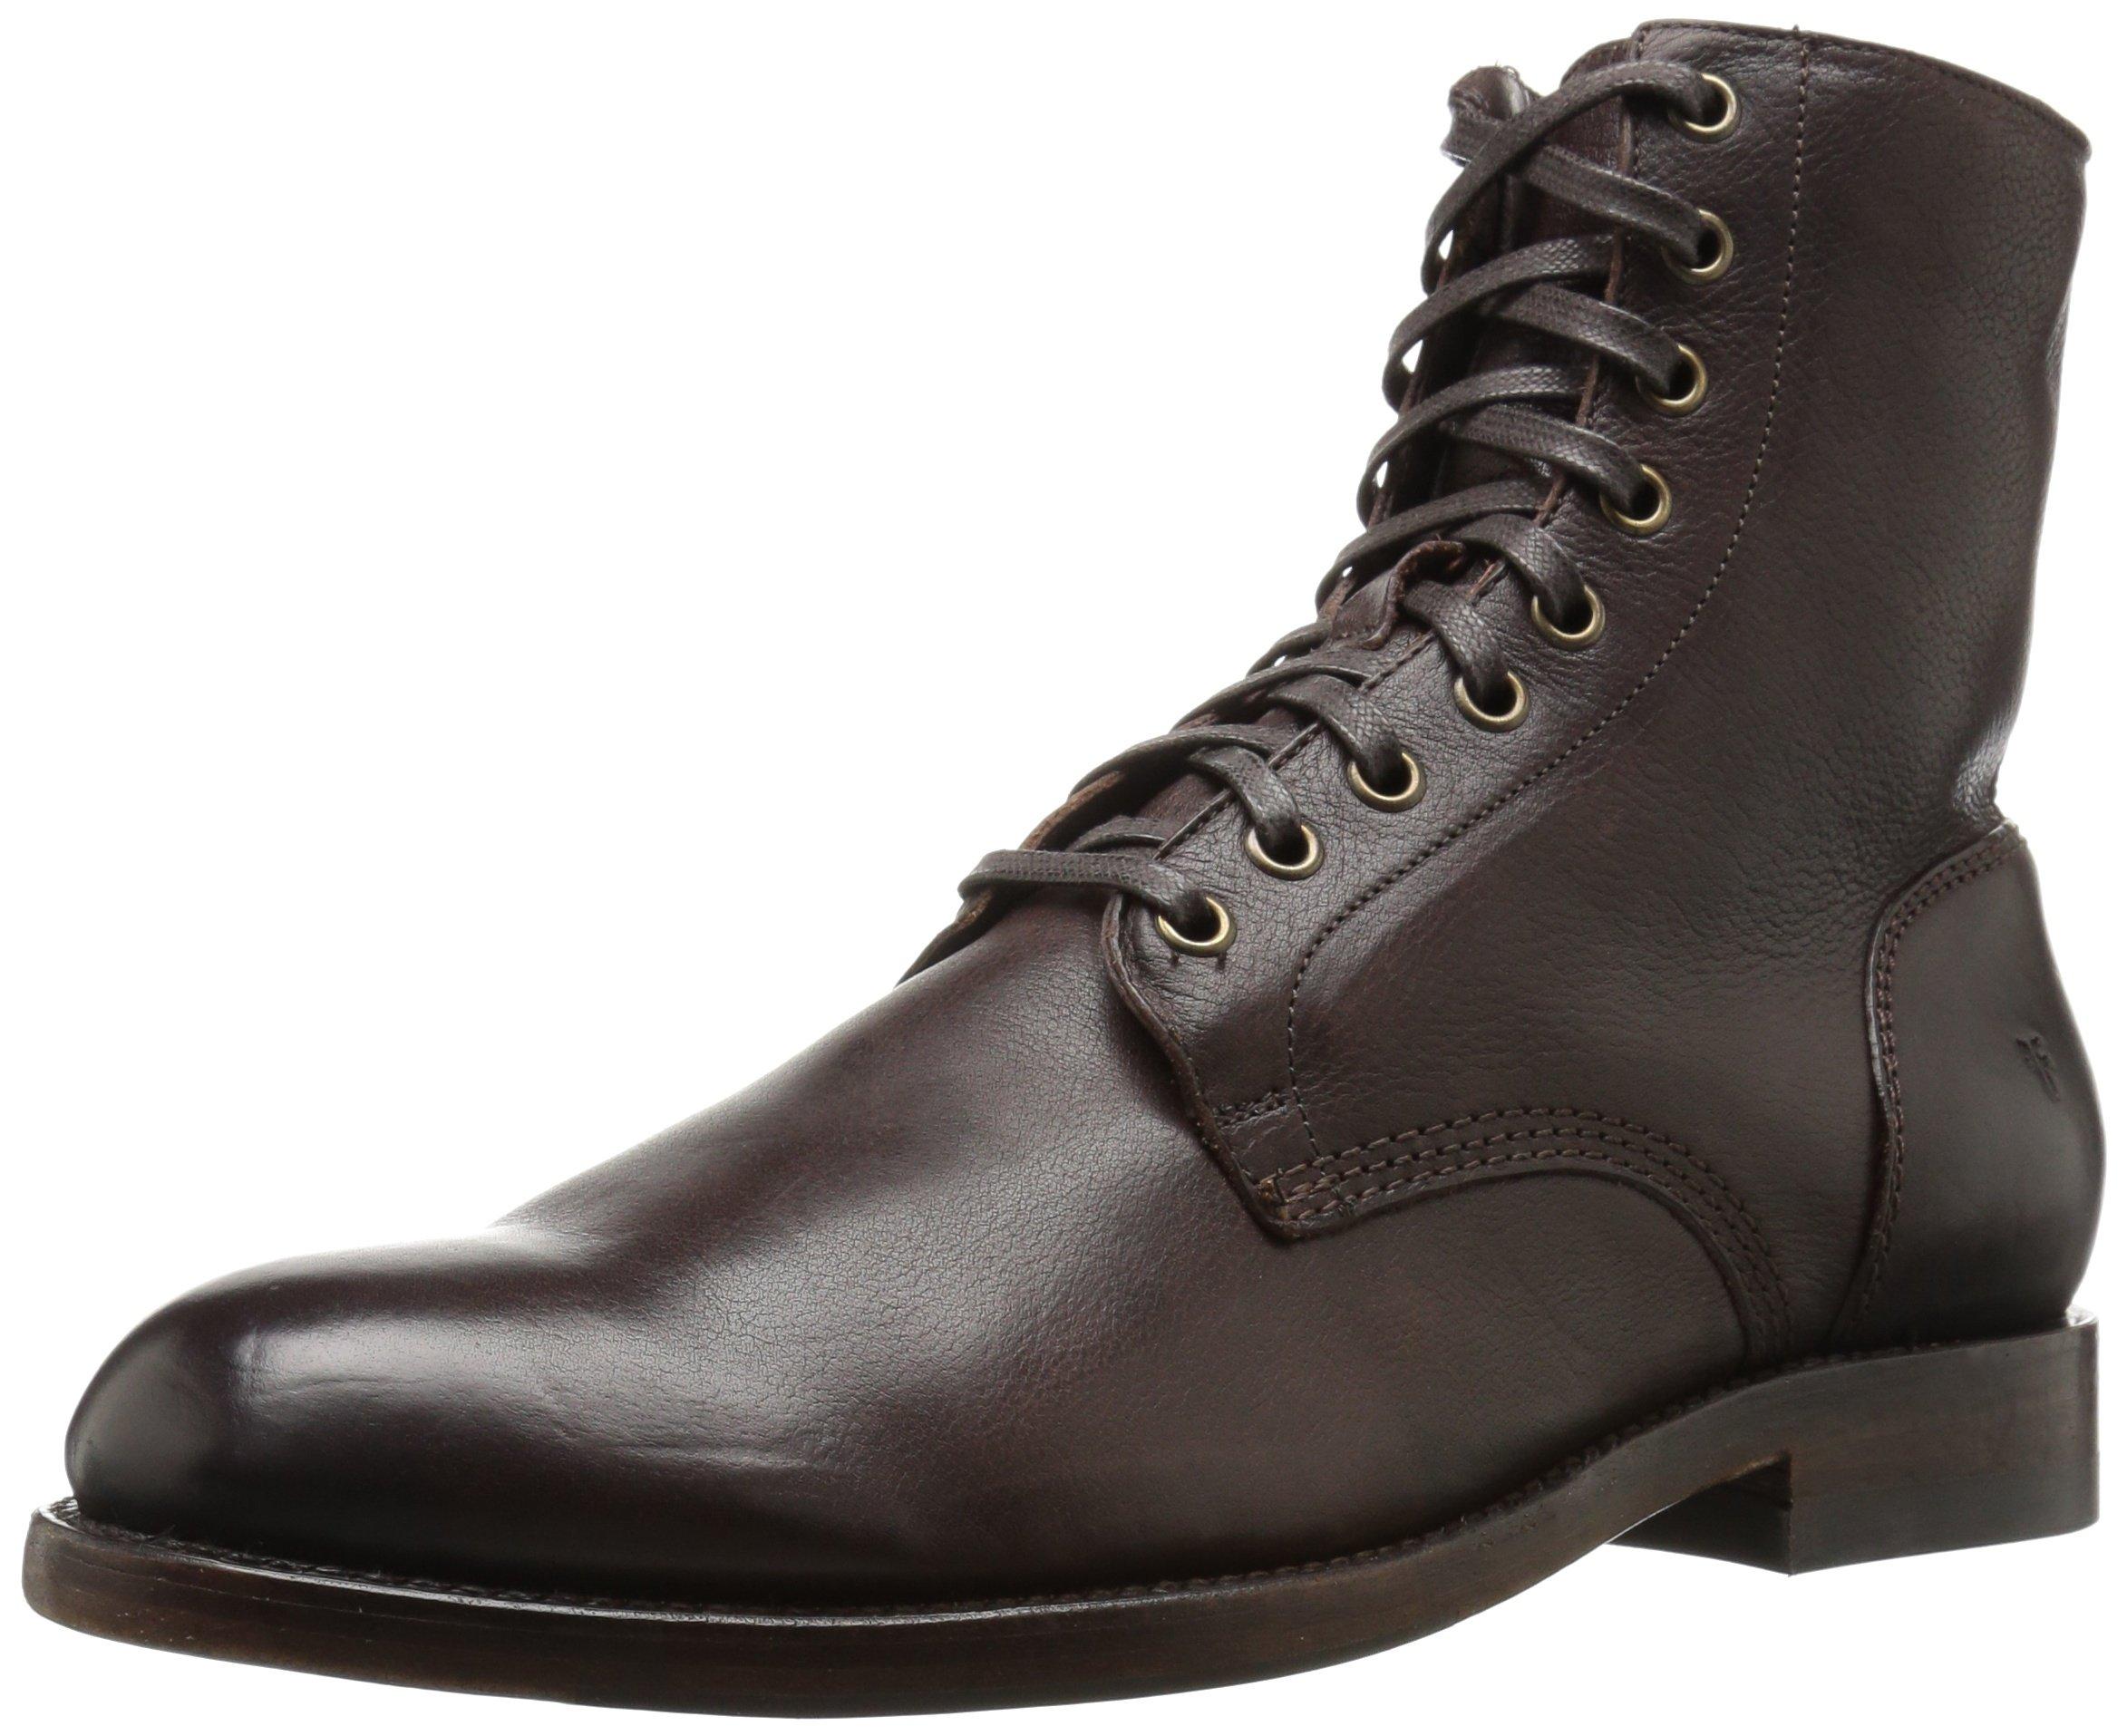 FRYE Men's Will Lace up Combat Boot, Dark Brown, 7 D US